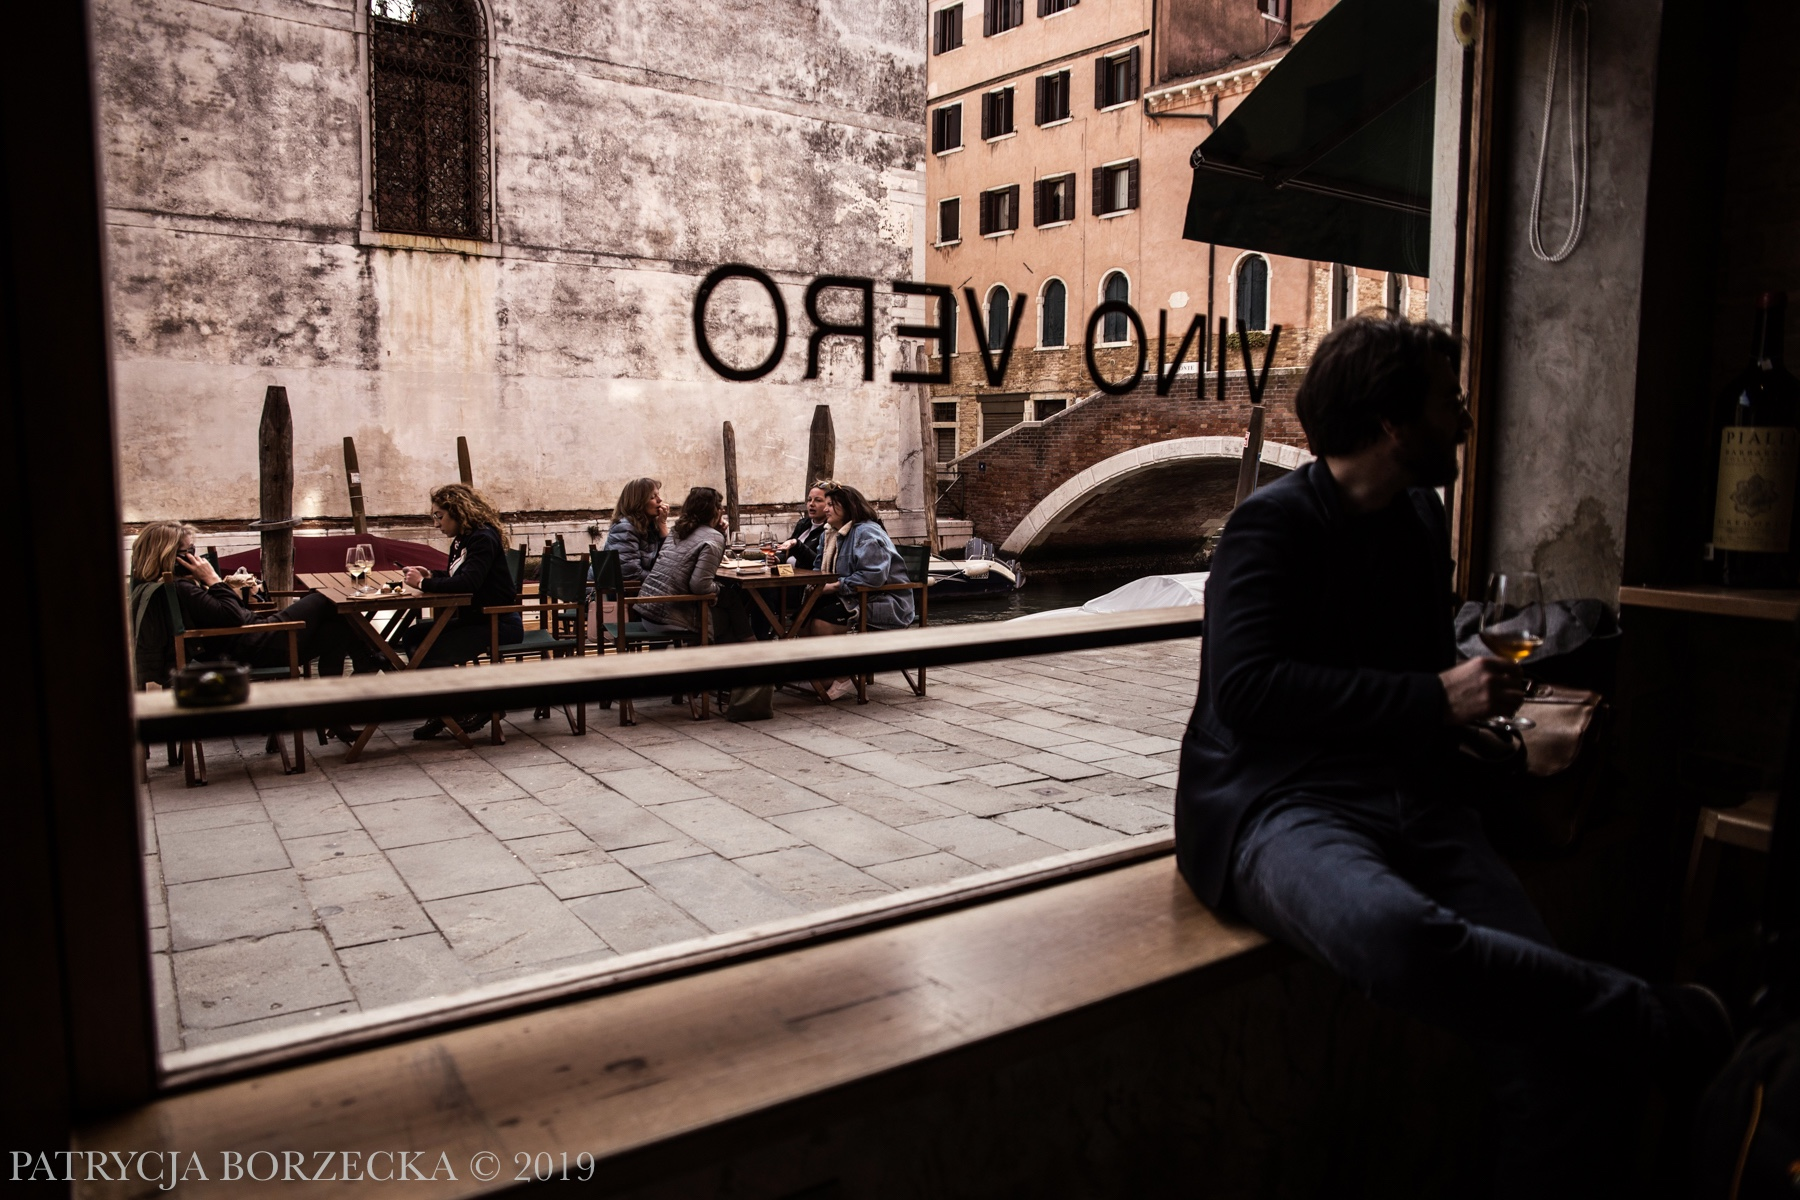 PatrycjaBorzecka-Photo-Venice-03